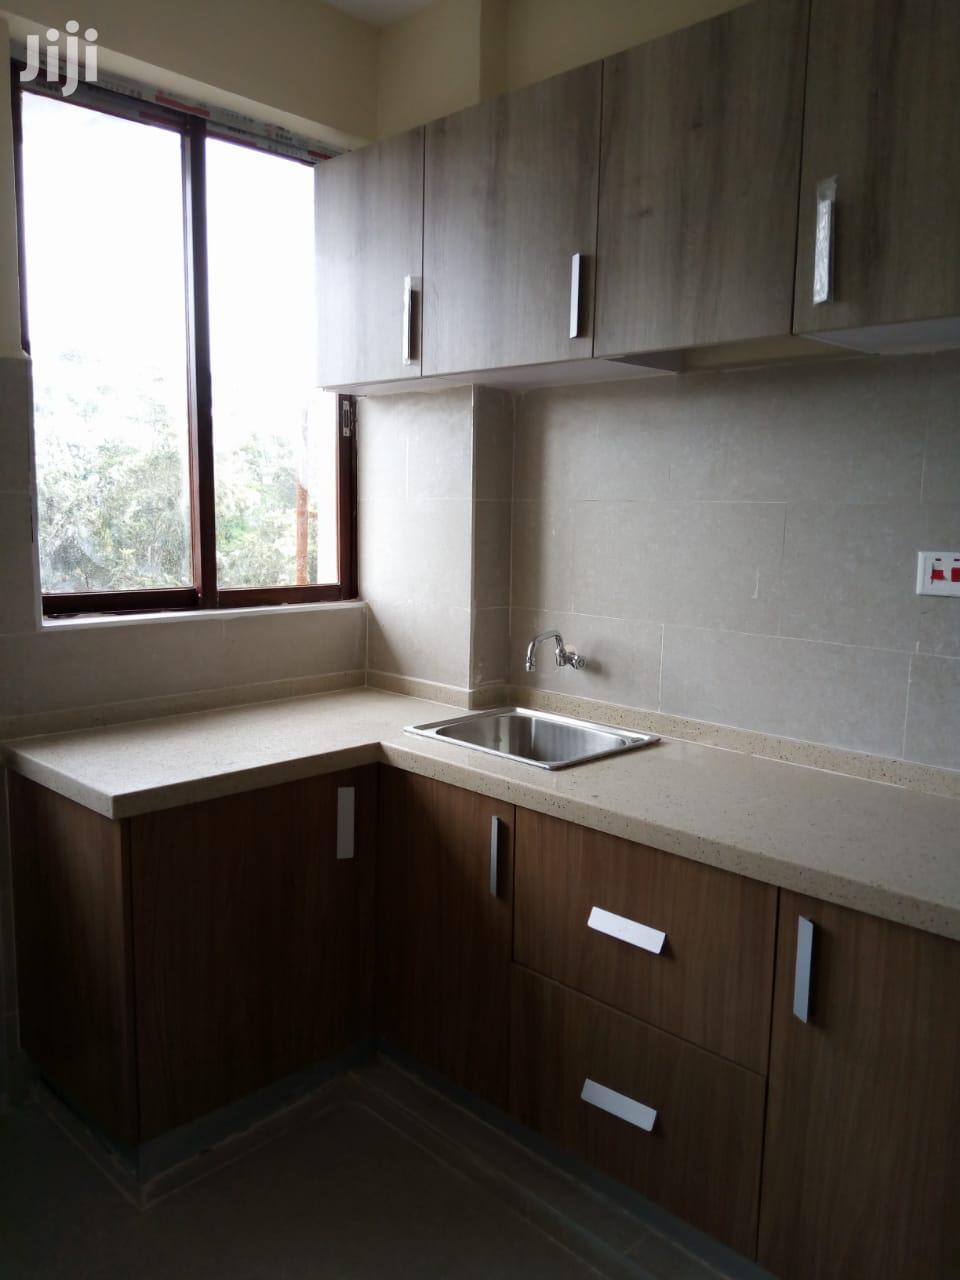 To Let 1bdrm At Kilimani Naivasha Road Nairobi Kenya   Houses & Apartments For Rent for sale in Kilimani, Nairobi, Kenya